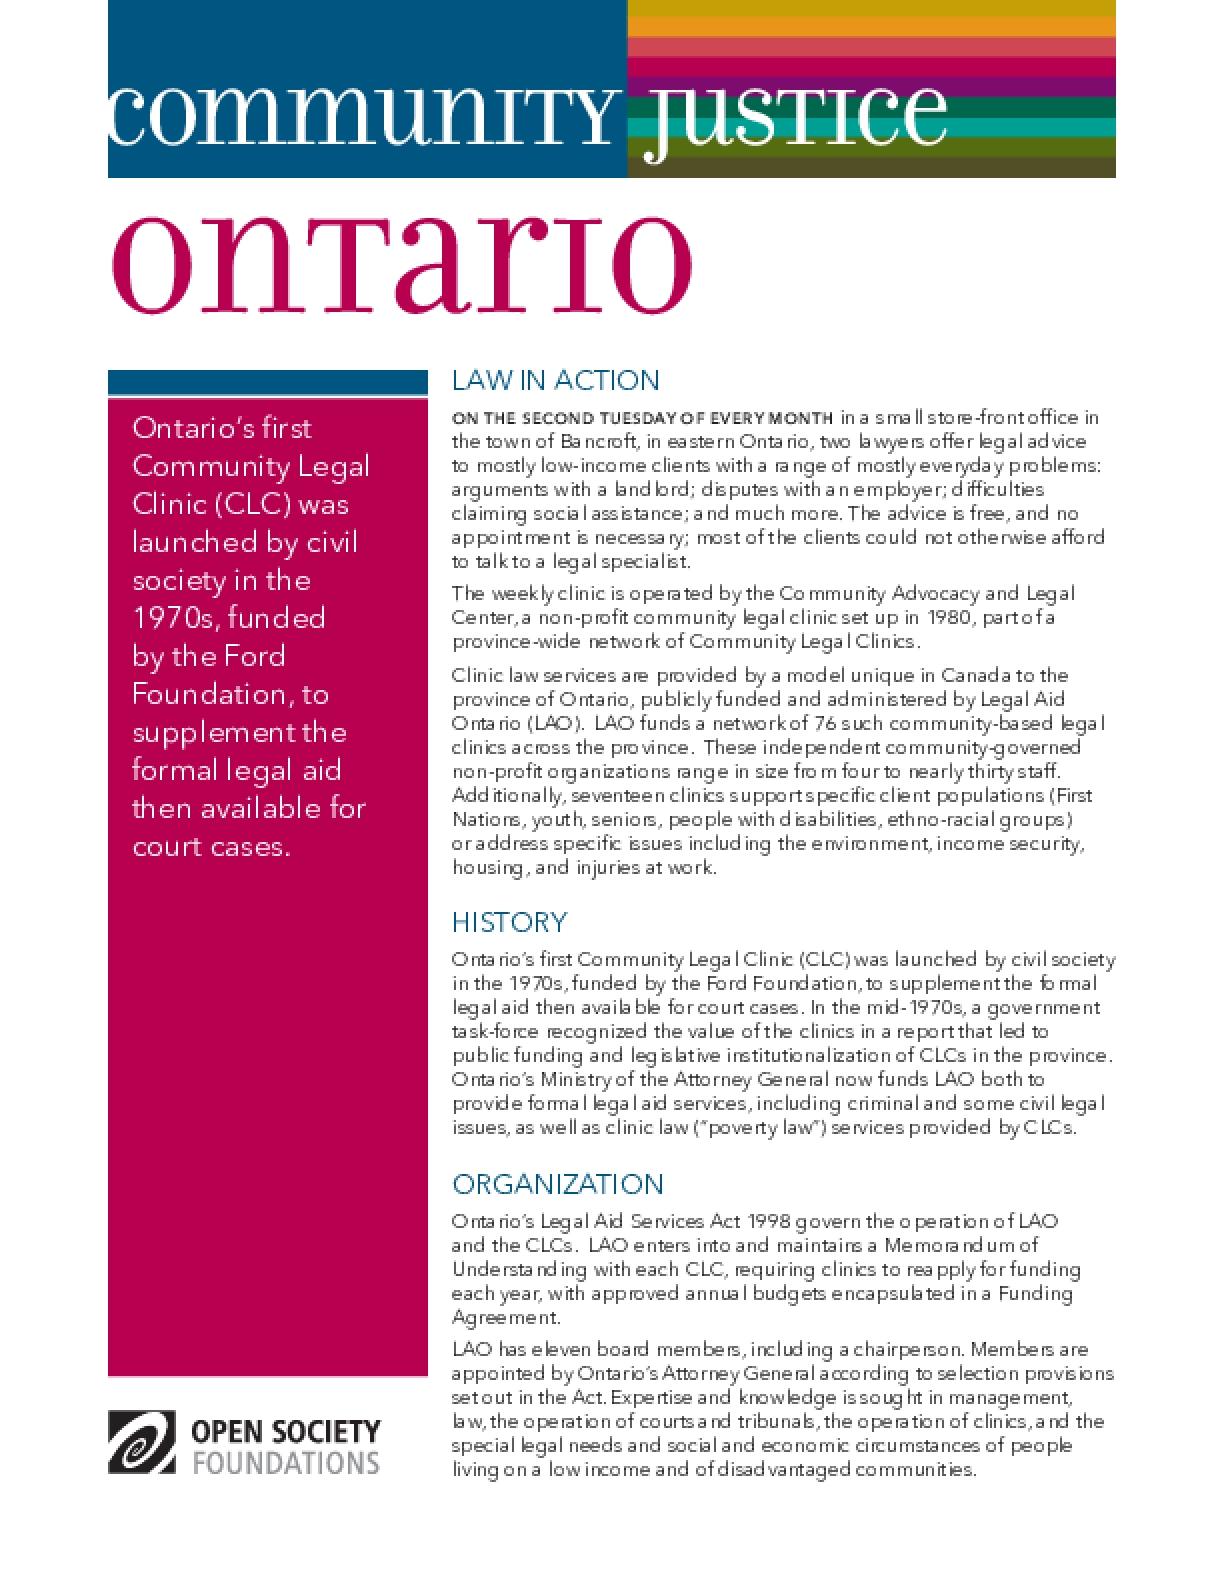 Community Justice Ontario